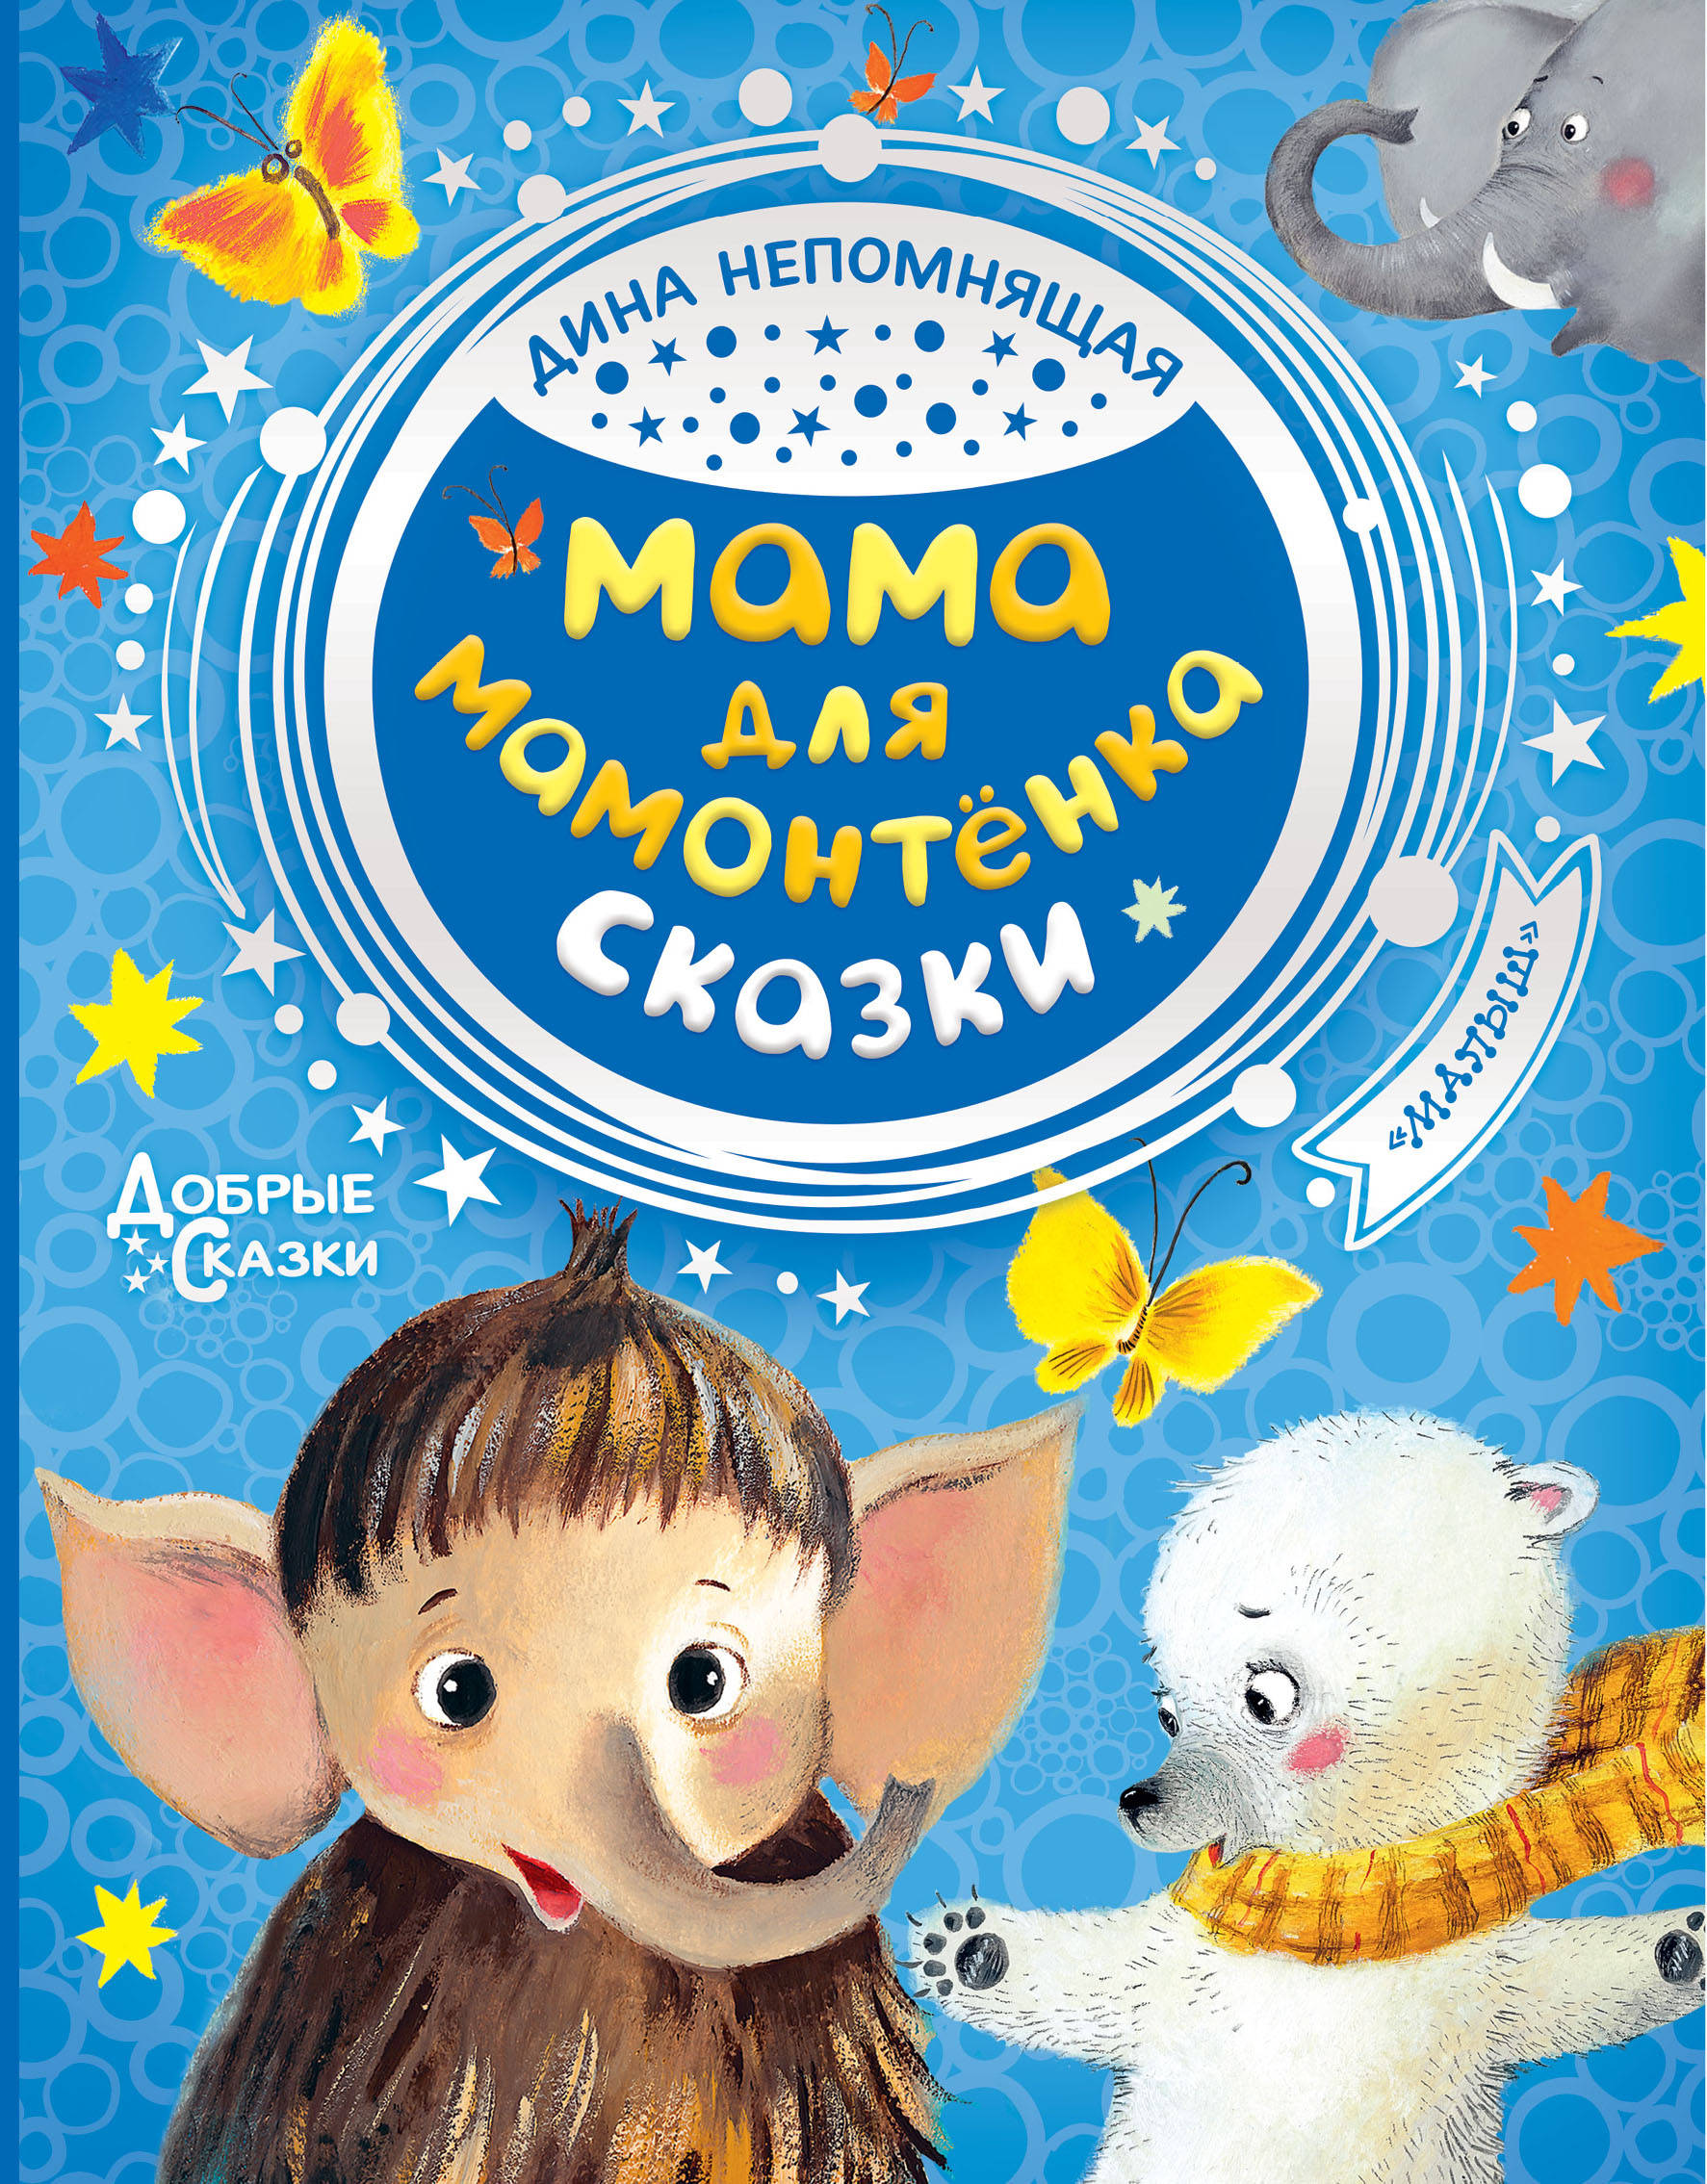 Непомнящая Дина Мама для мамонтенка. Сказки непомнящая д мама для мамонтёнка